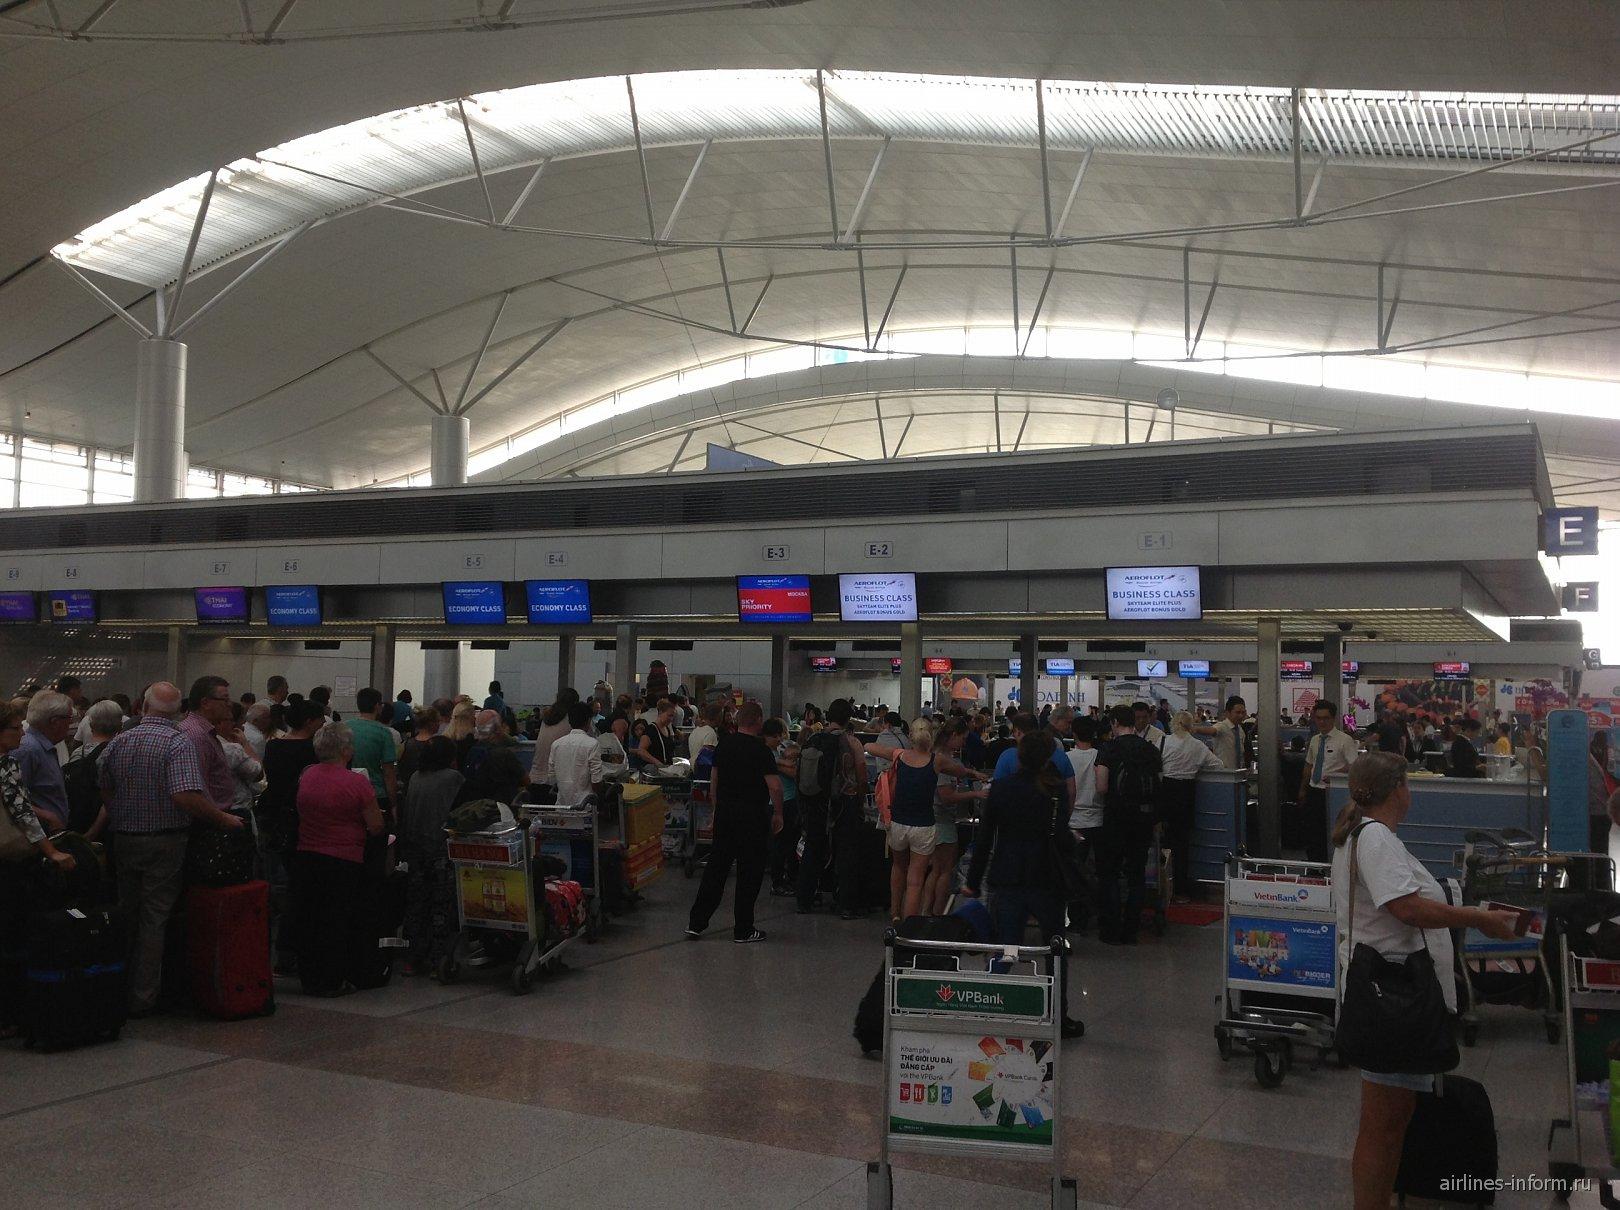 Стойки регистрации в аэропорту Хошимин Тан Сон Нхат